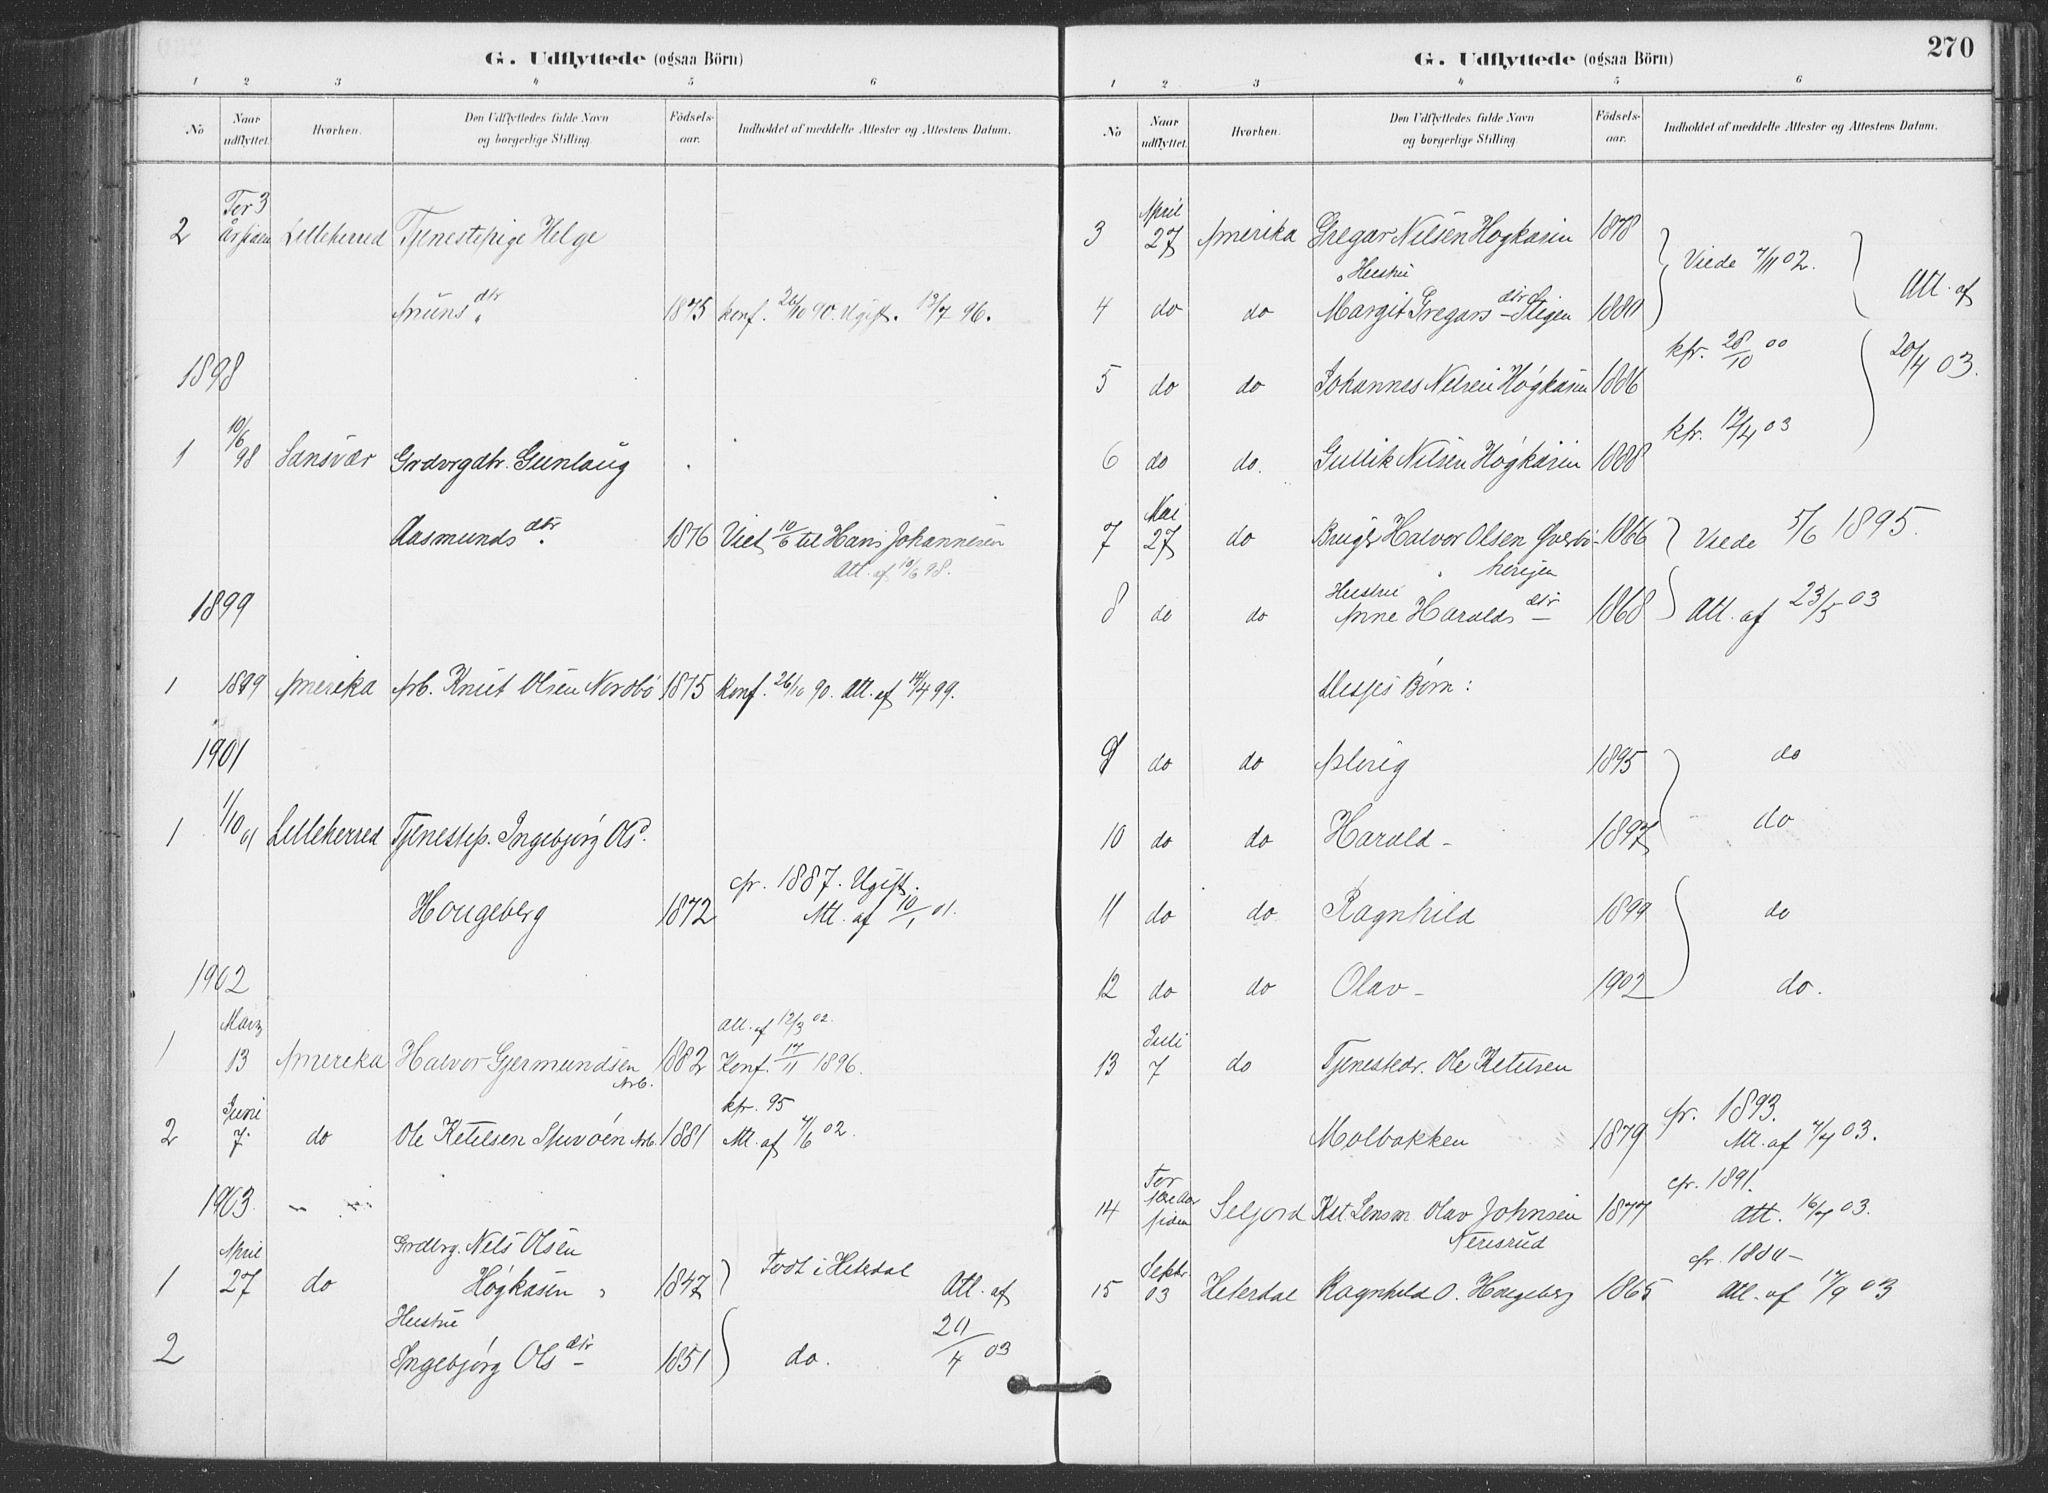 SAKO, Hjartdal kirkebøker, F/Fa/L0010: Ministerialbok nr. I 10, 1880-1929, s. 270